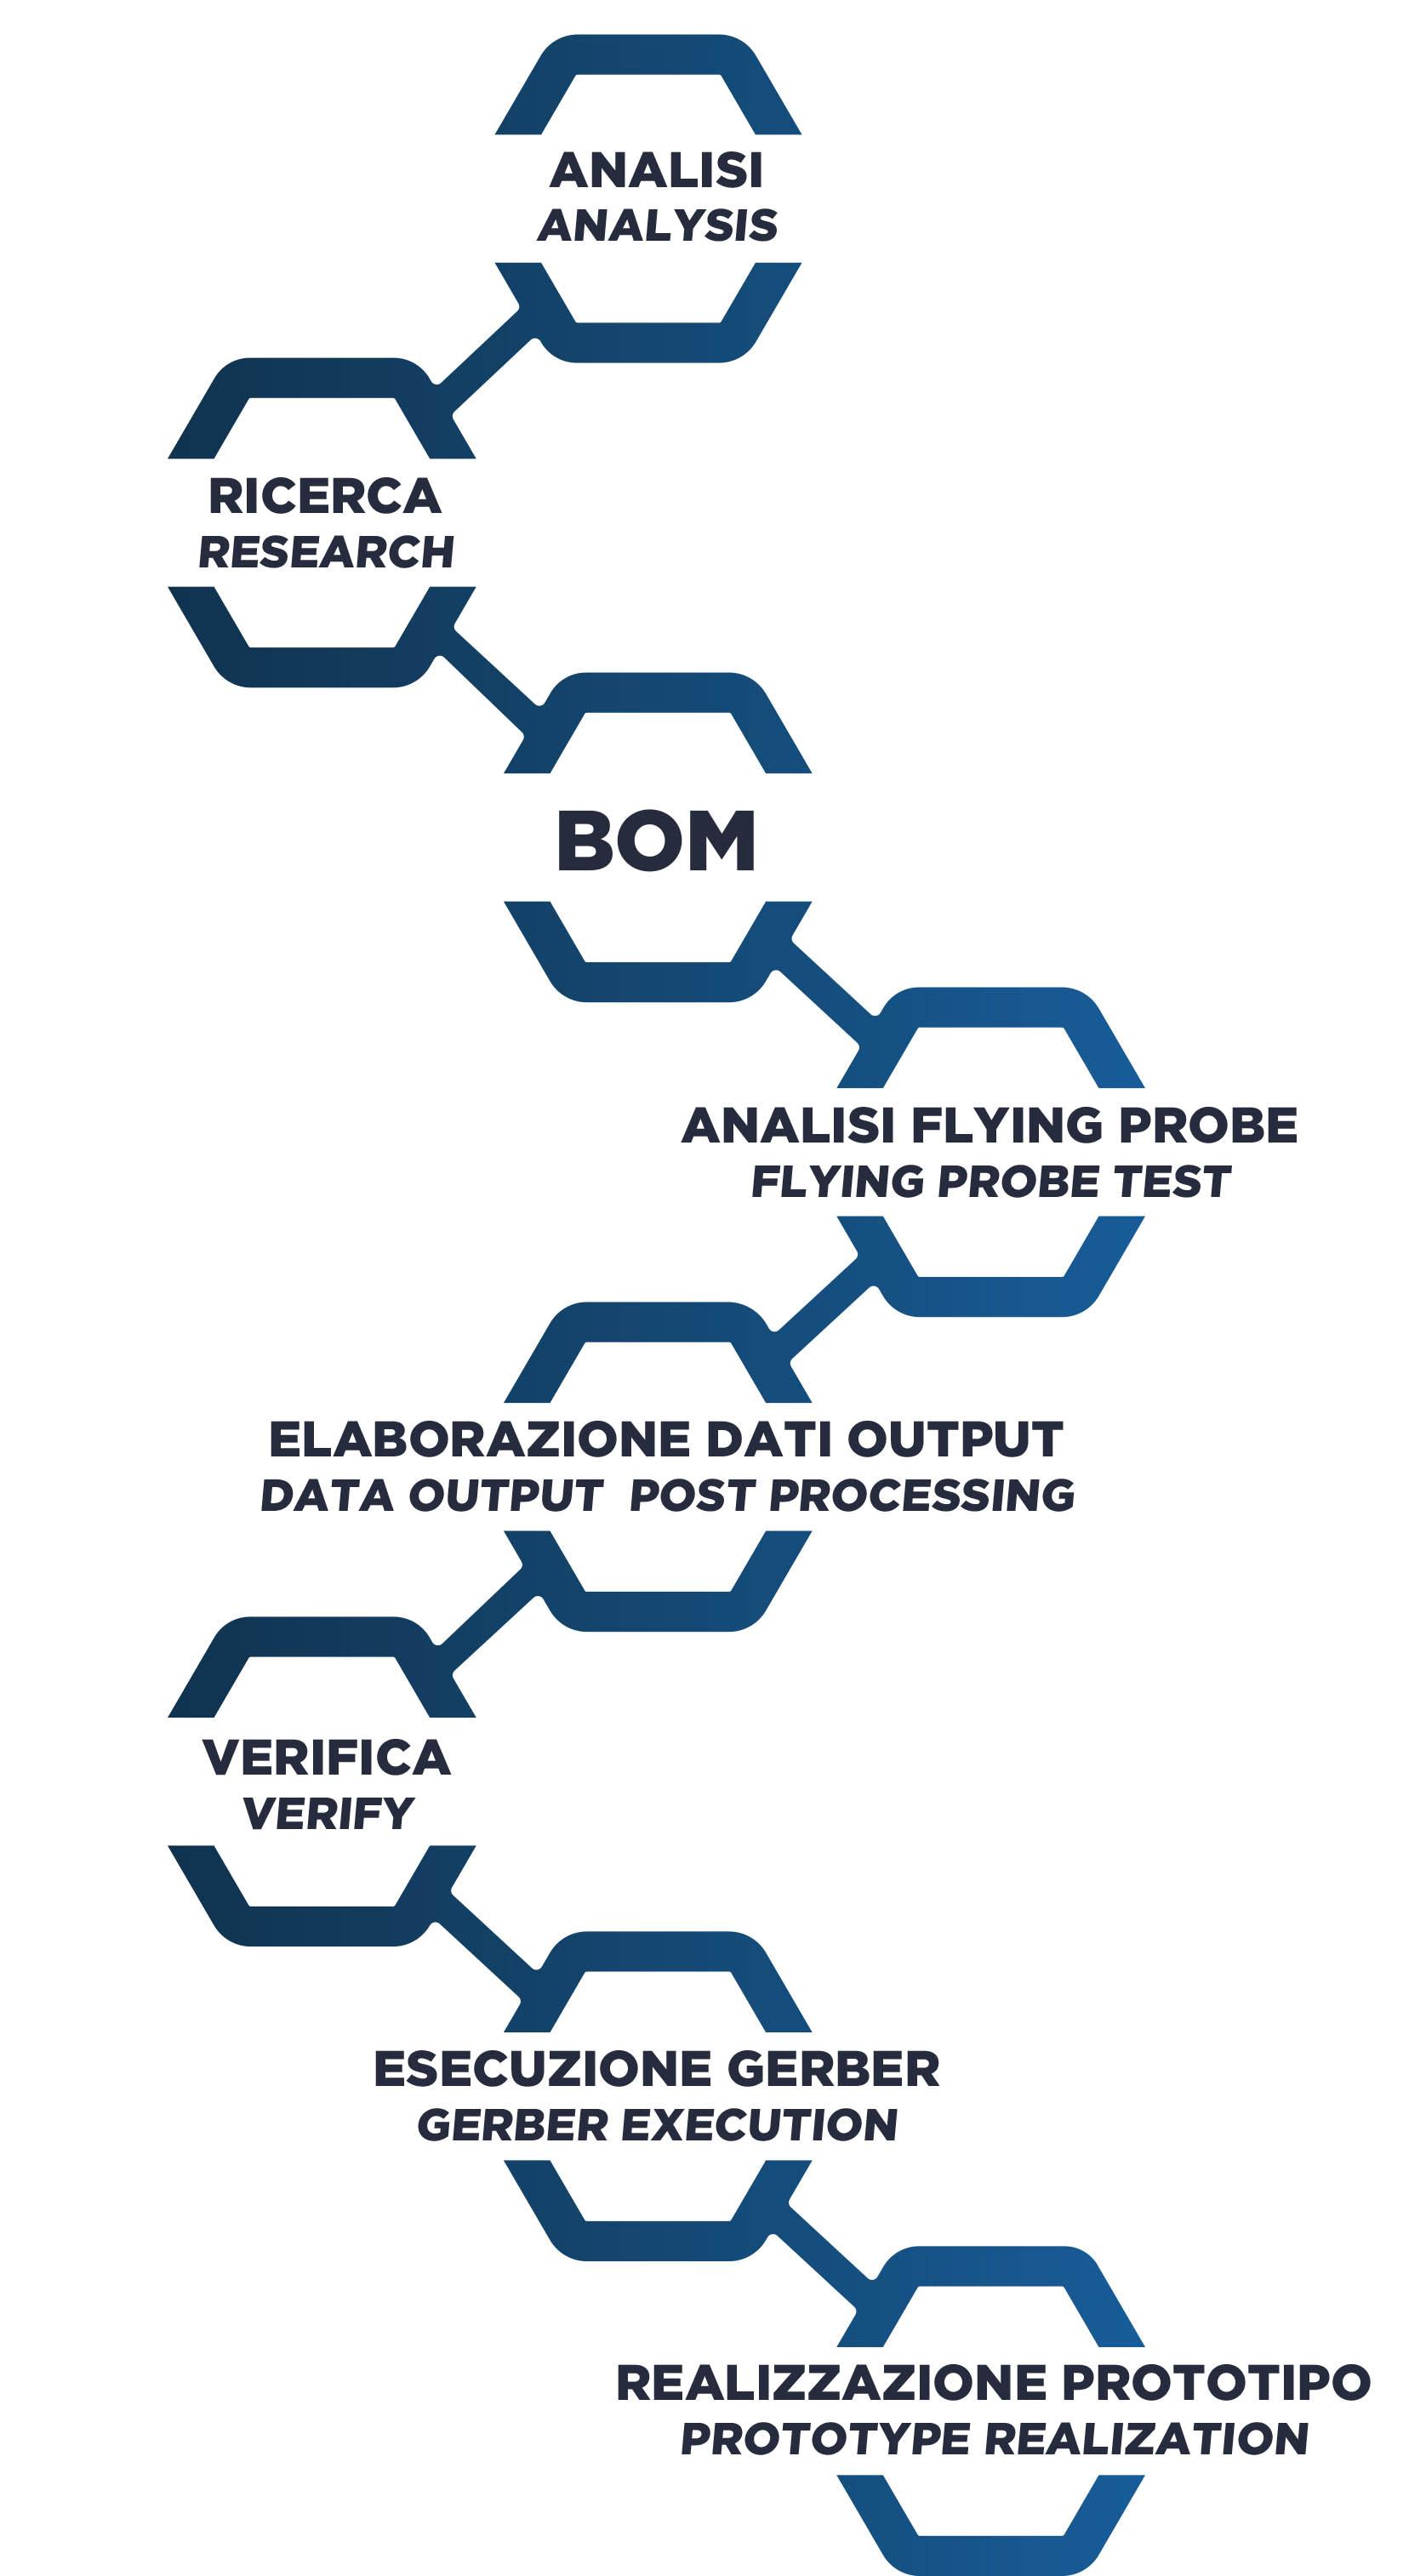 Analisi-PCB